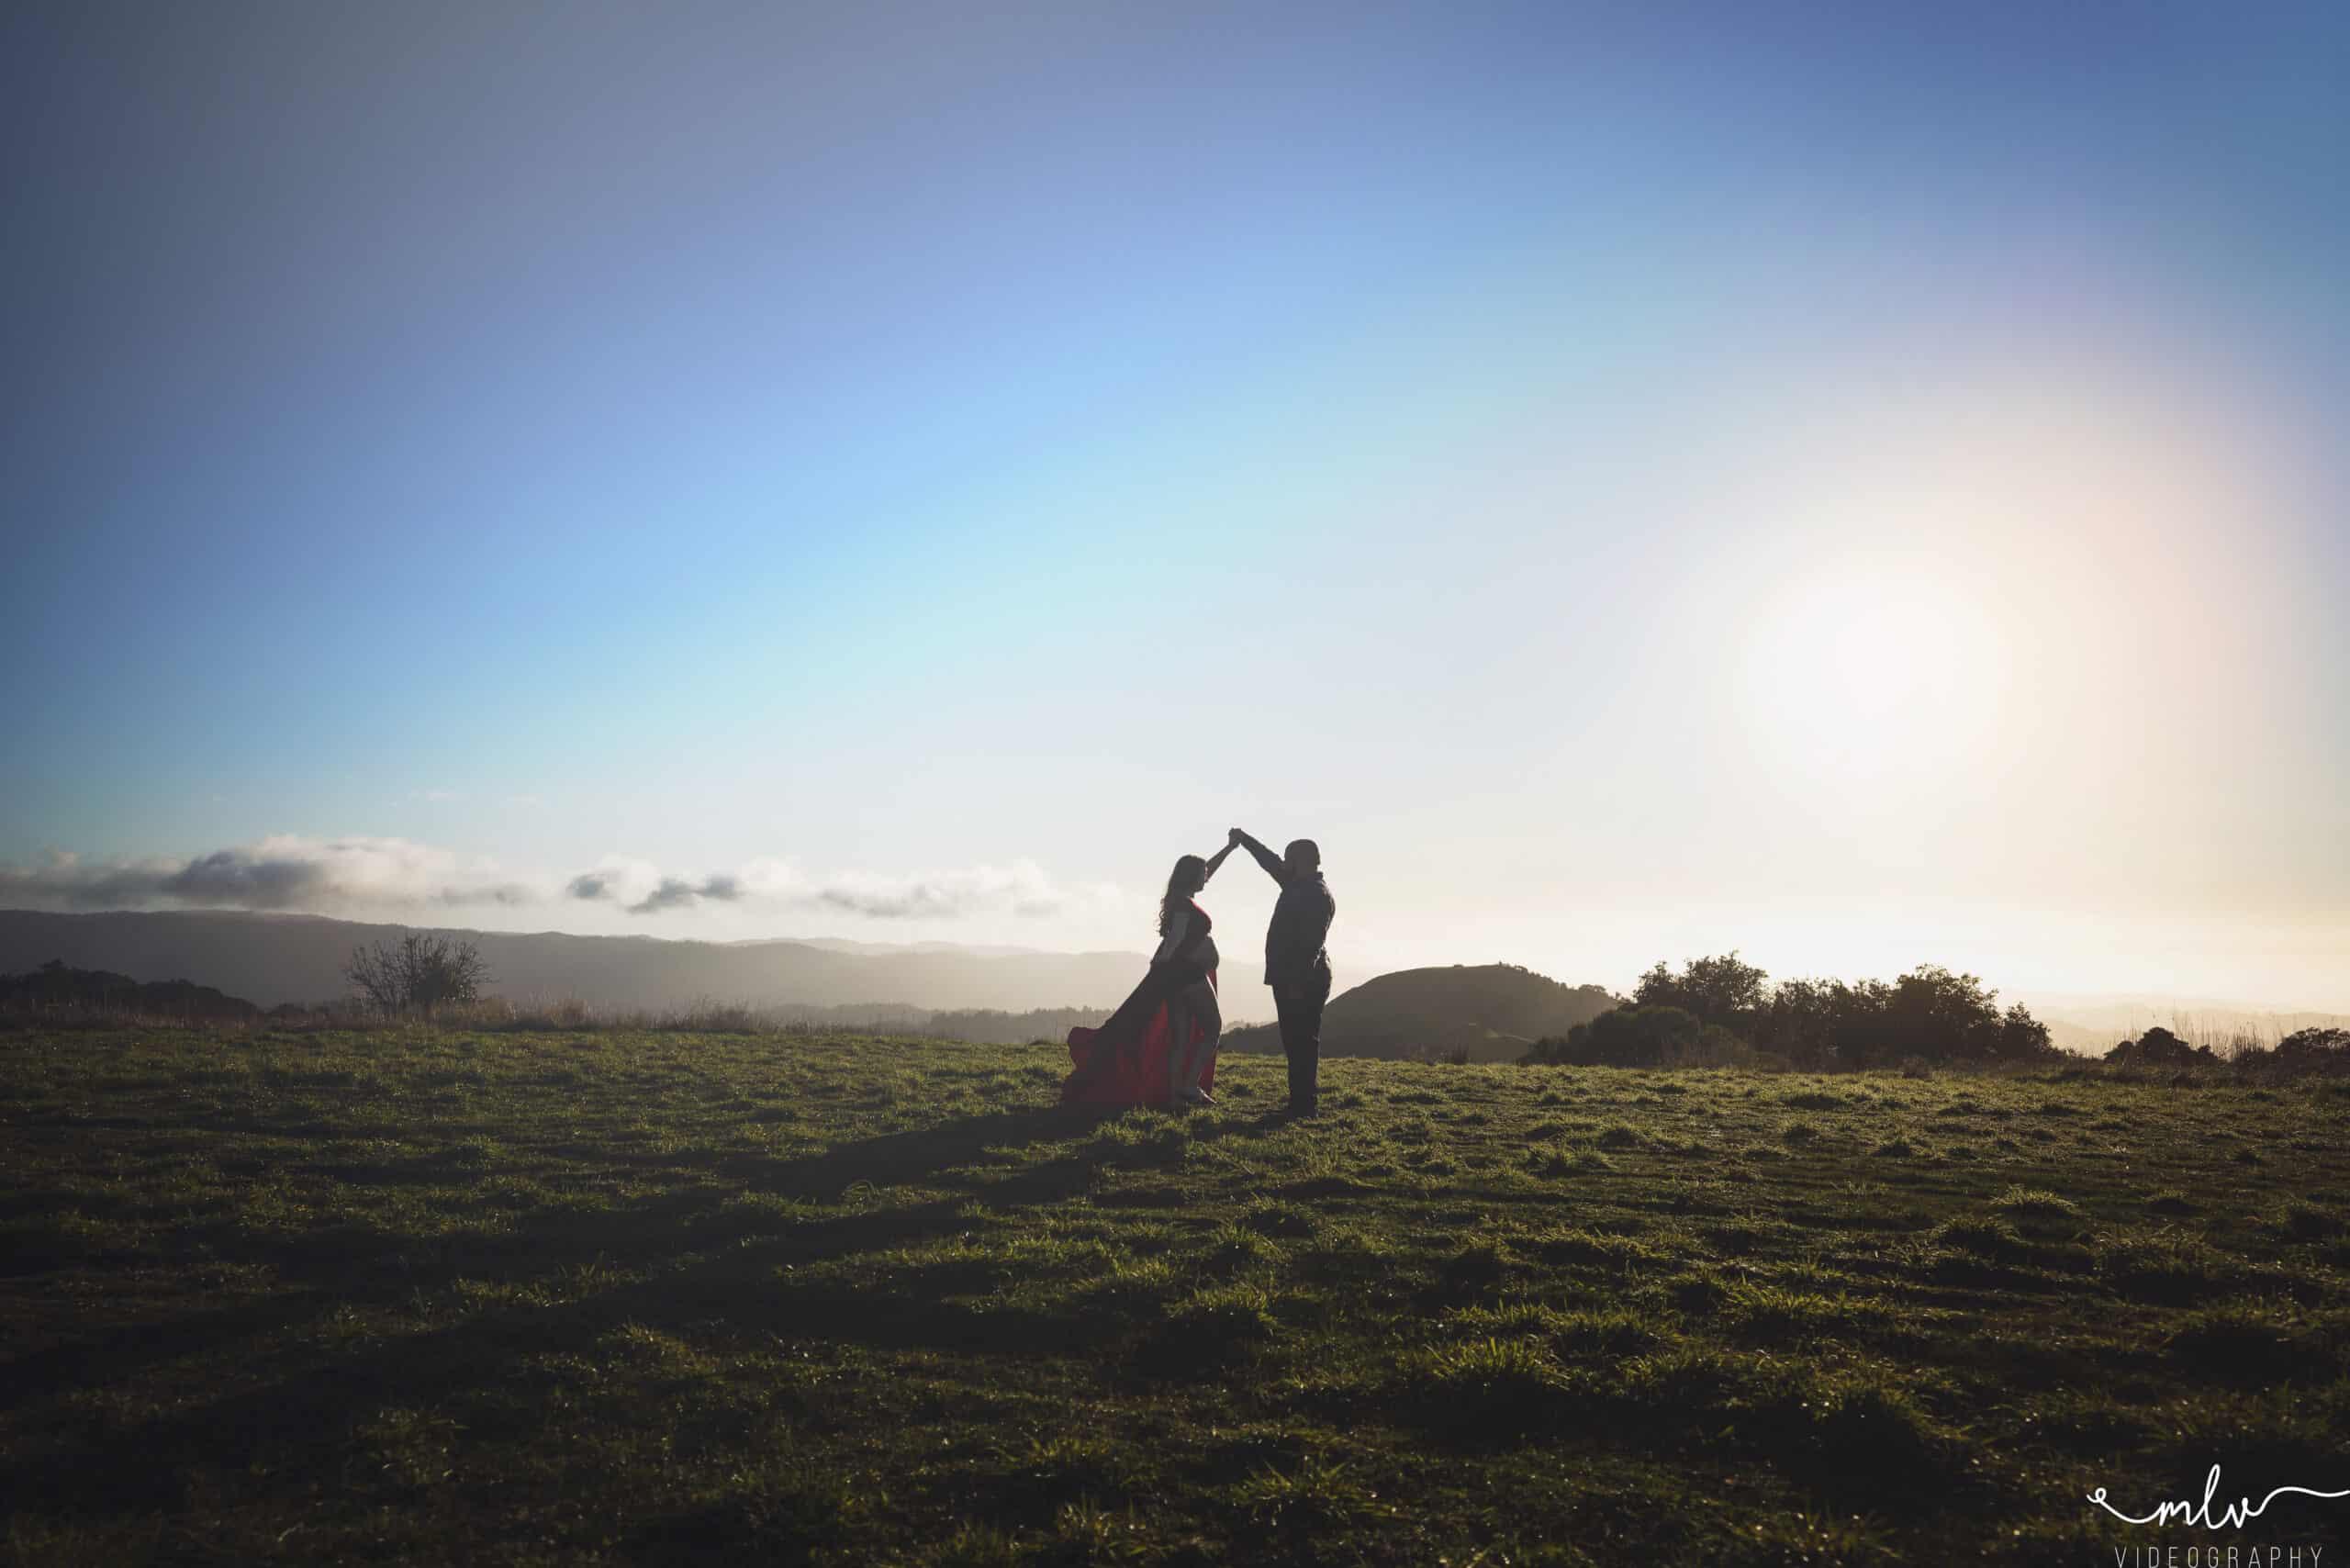 Maternity photography at Skyline Ridge Preserve